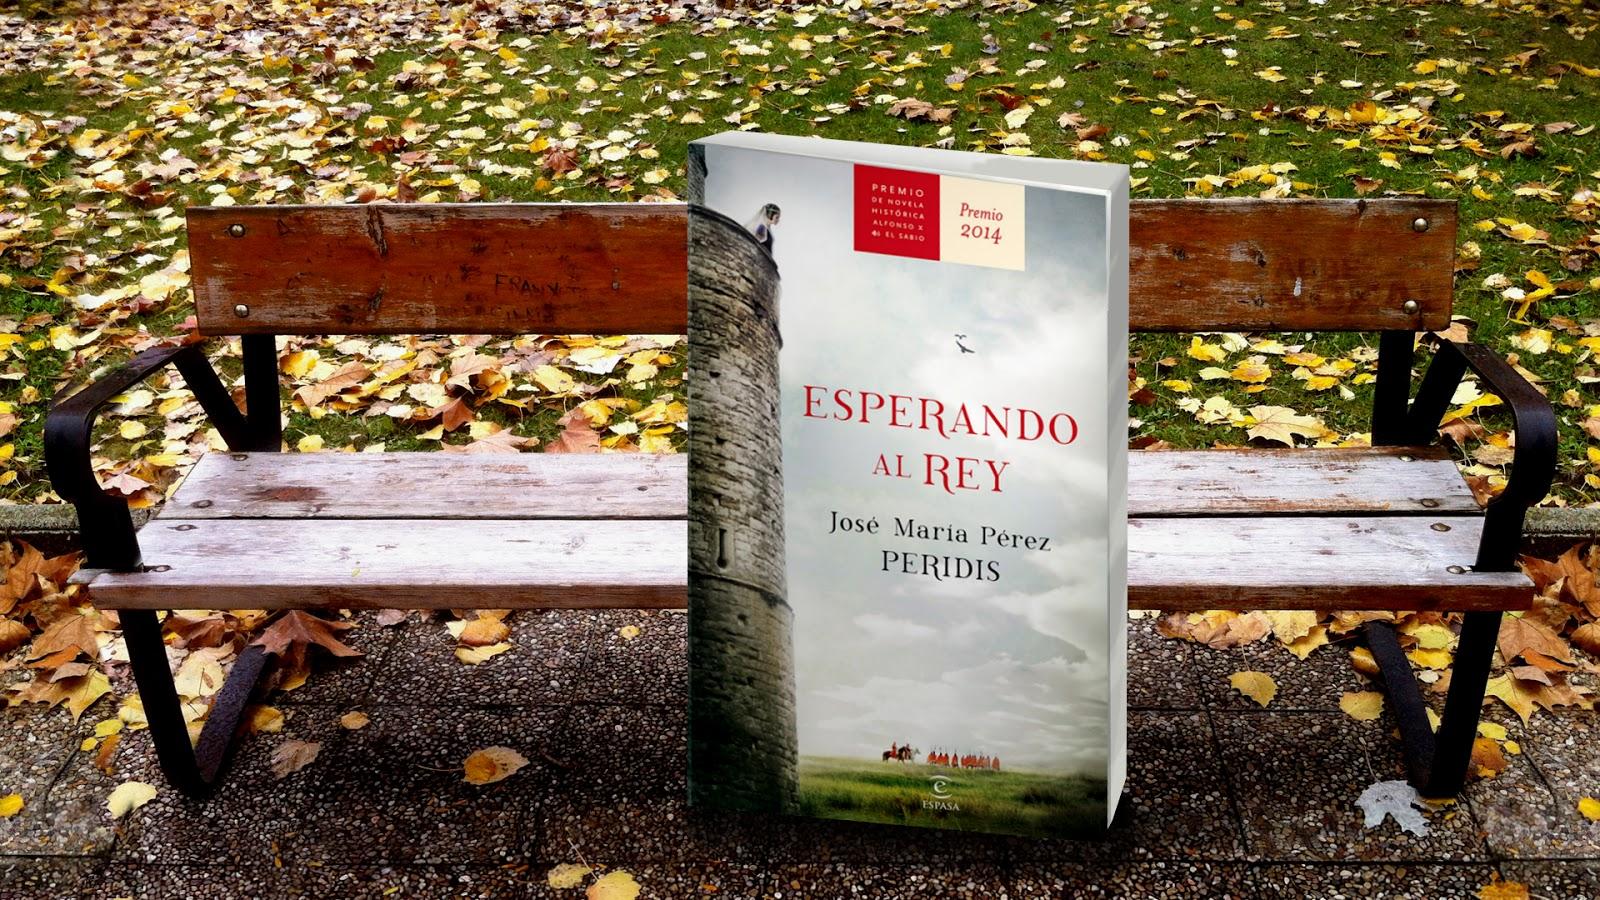 Presentación libro de Peridis, 2014 Abbé Nozal